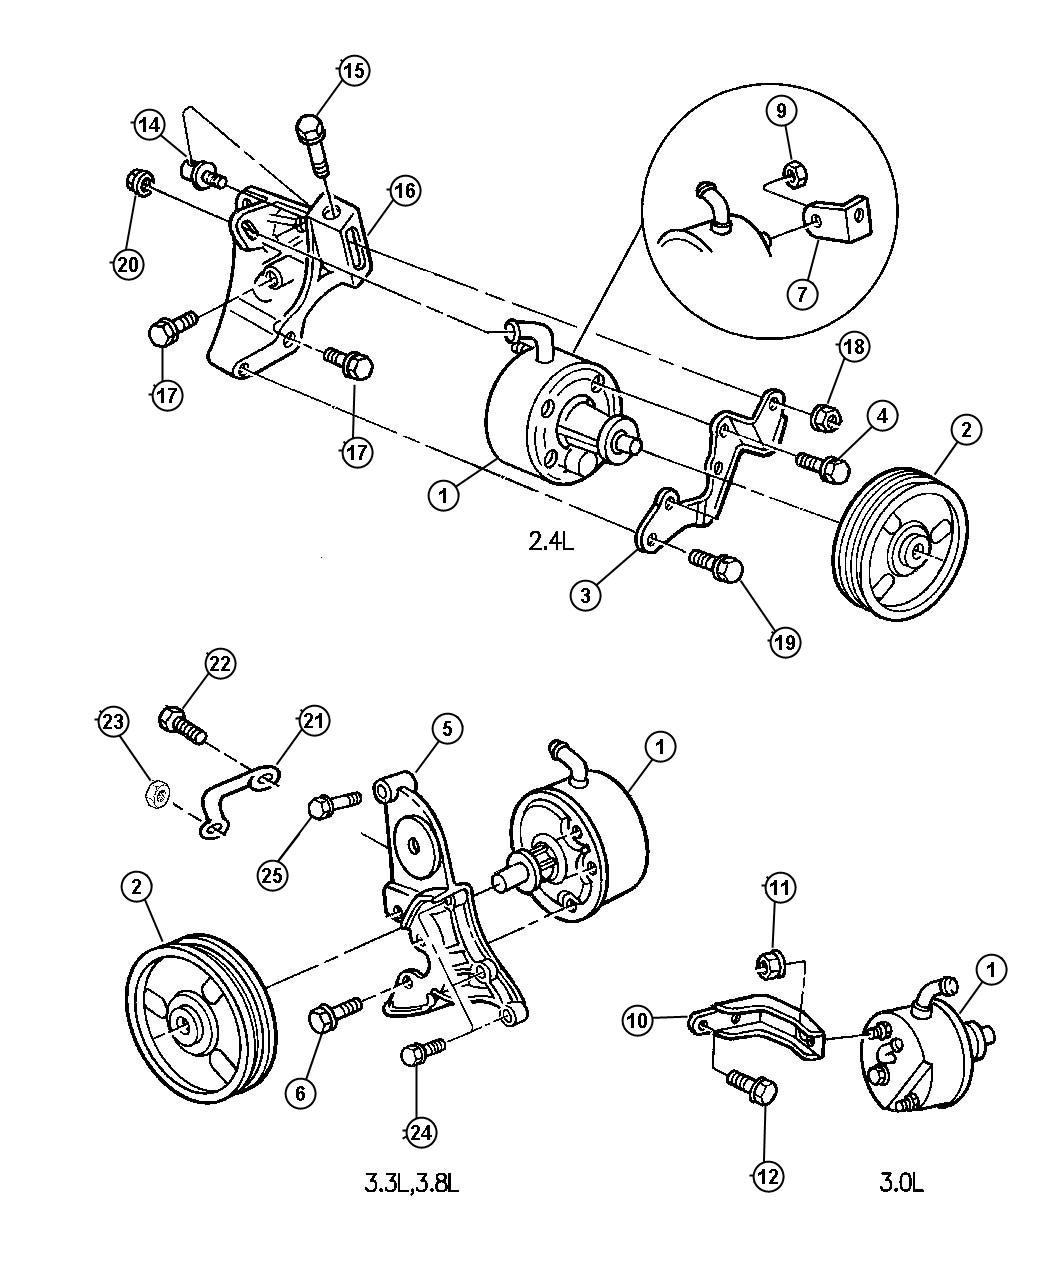 1997 Chrysler Voyager Pulley. Power steering pump. Pulley